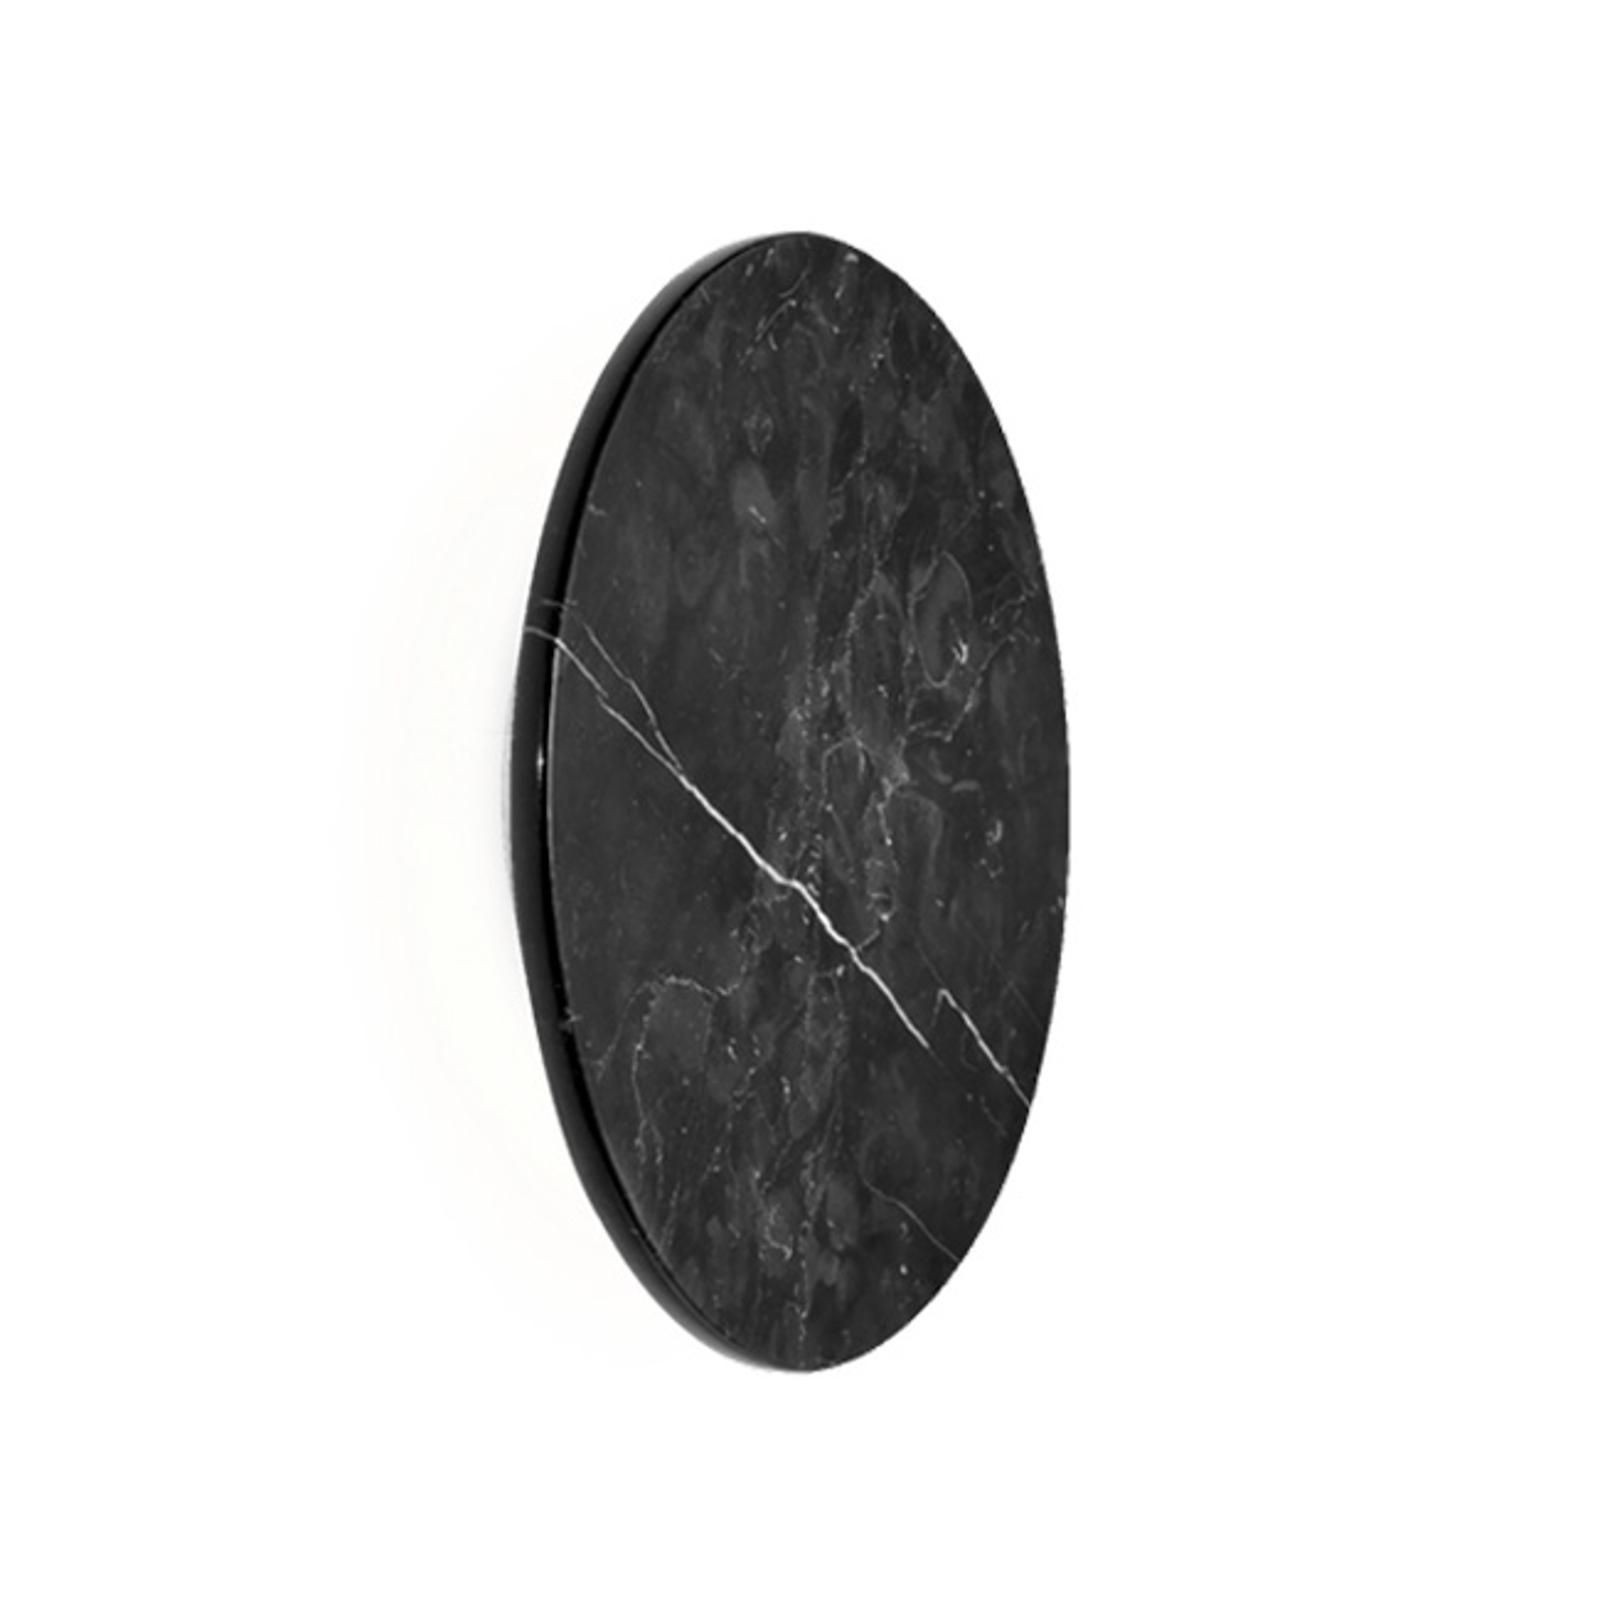 WEVER & DUCRÉ Miles 3.0 round muur Ø 26cm zwart